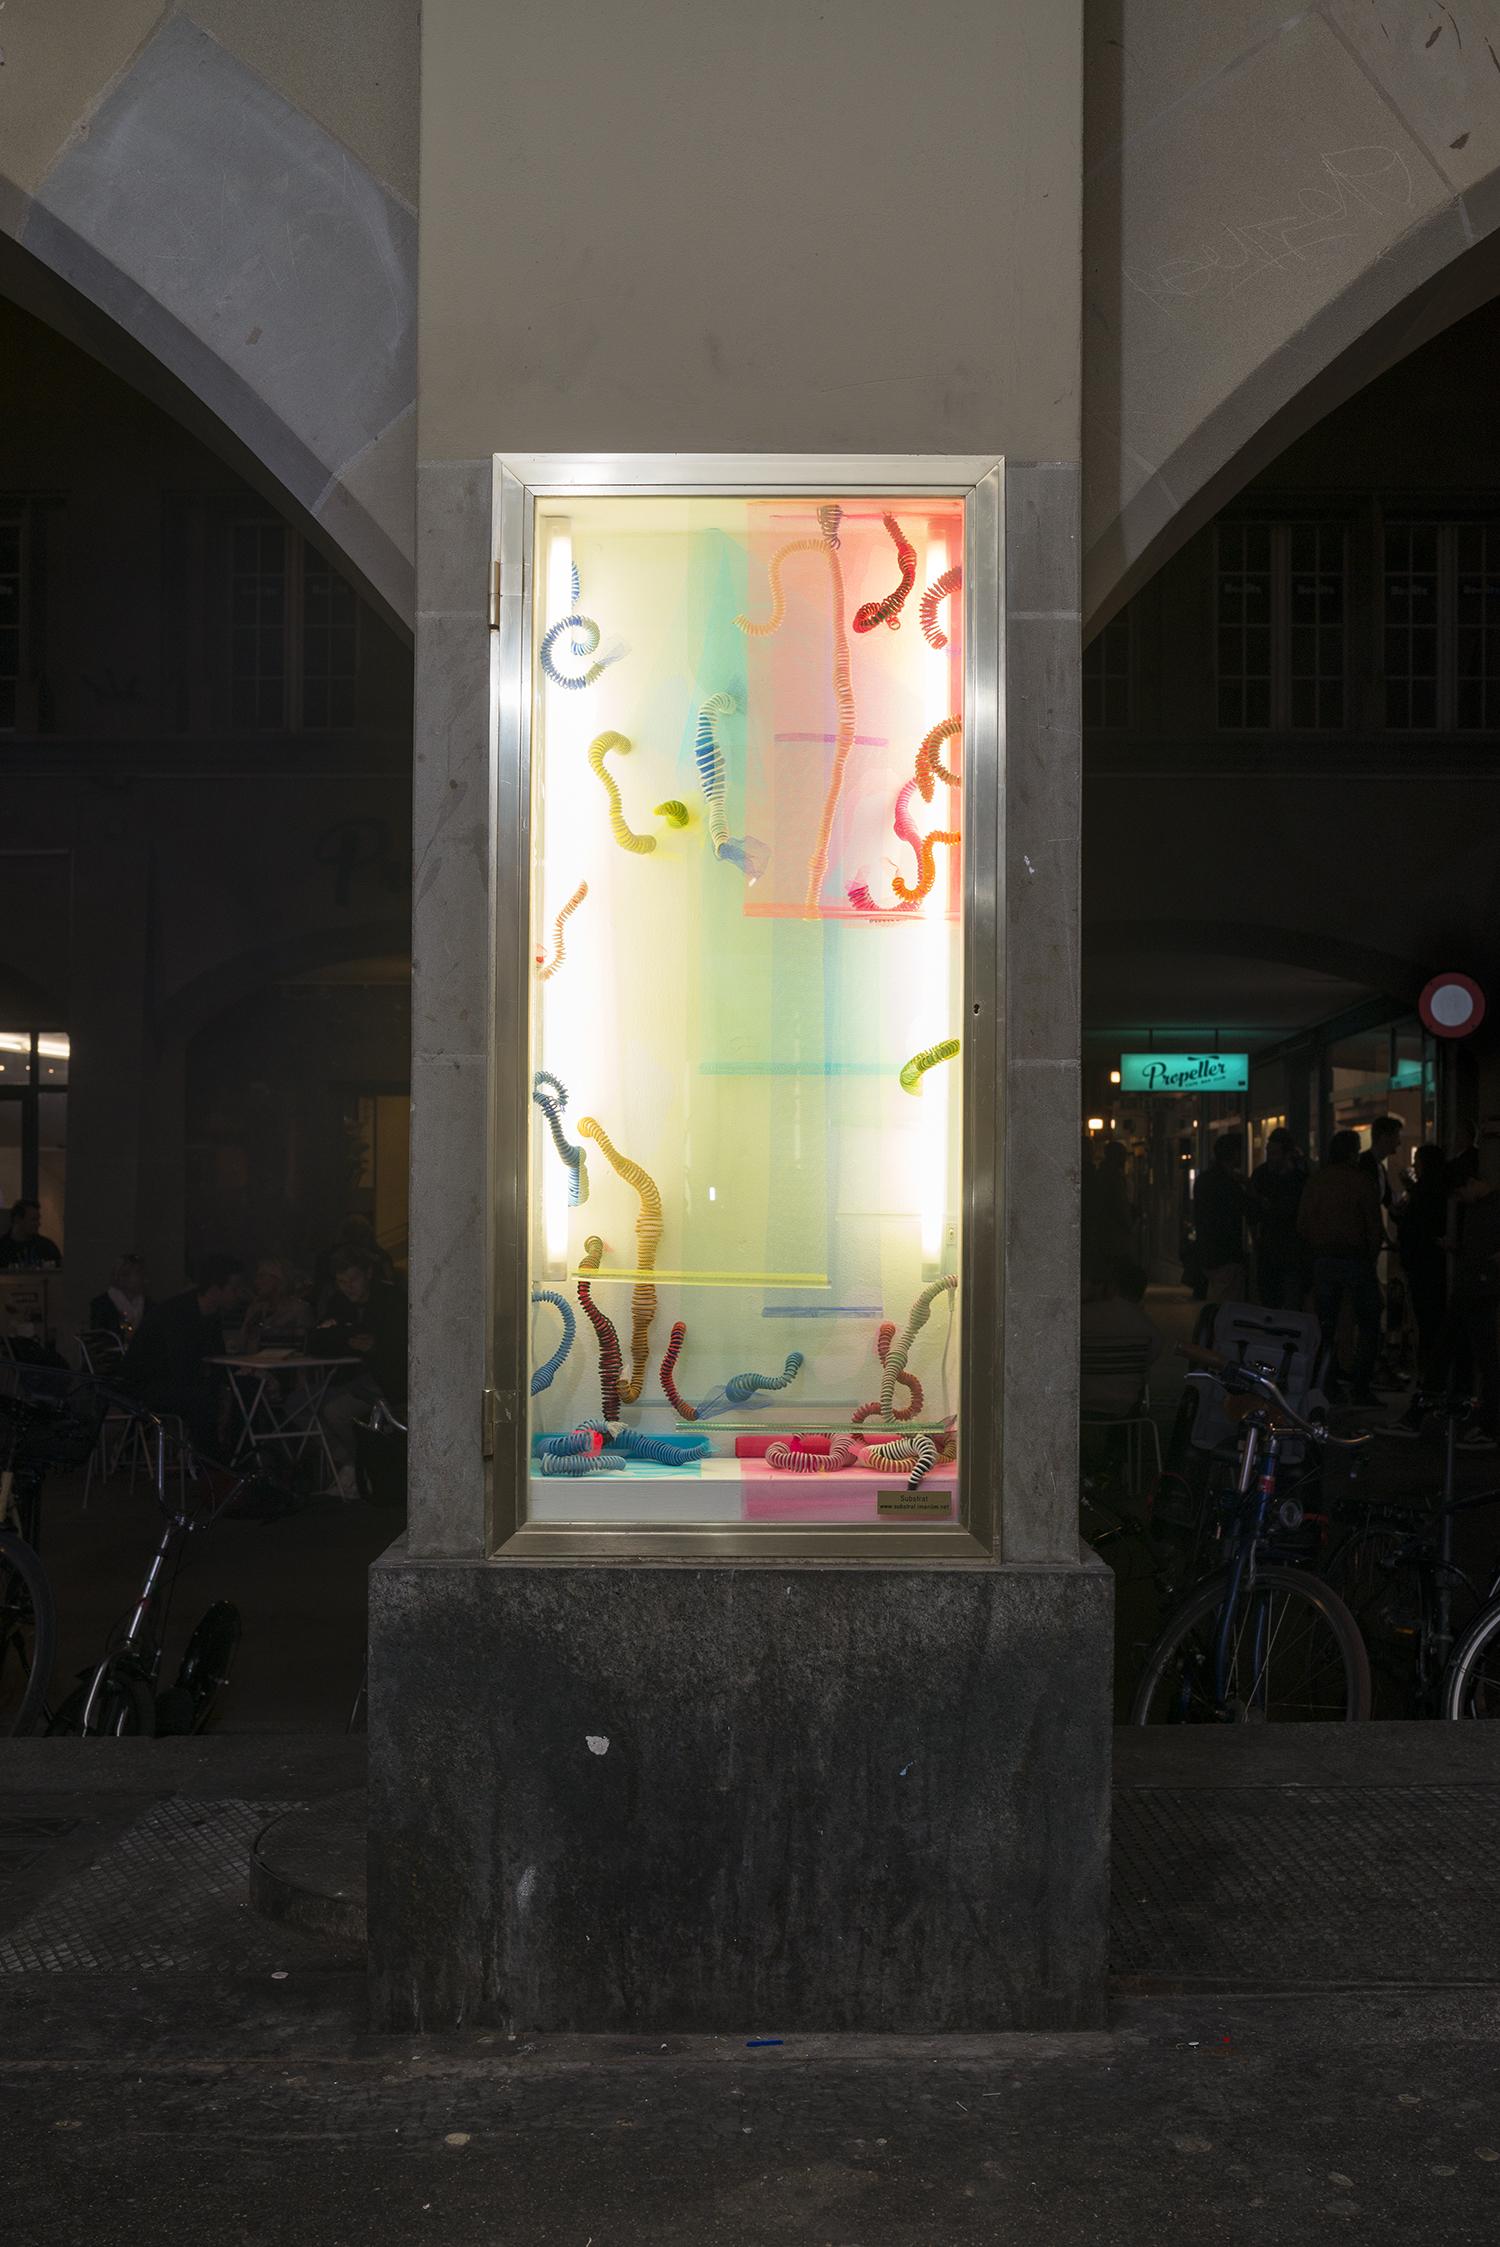 Tamara Hauser Kunst Art Samuel Rauber Substrat Projektraum Bern Offspace Galerie